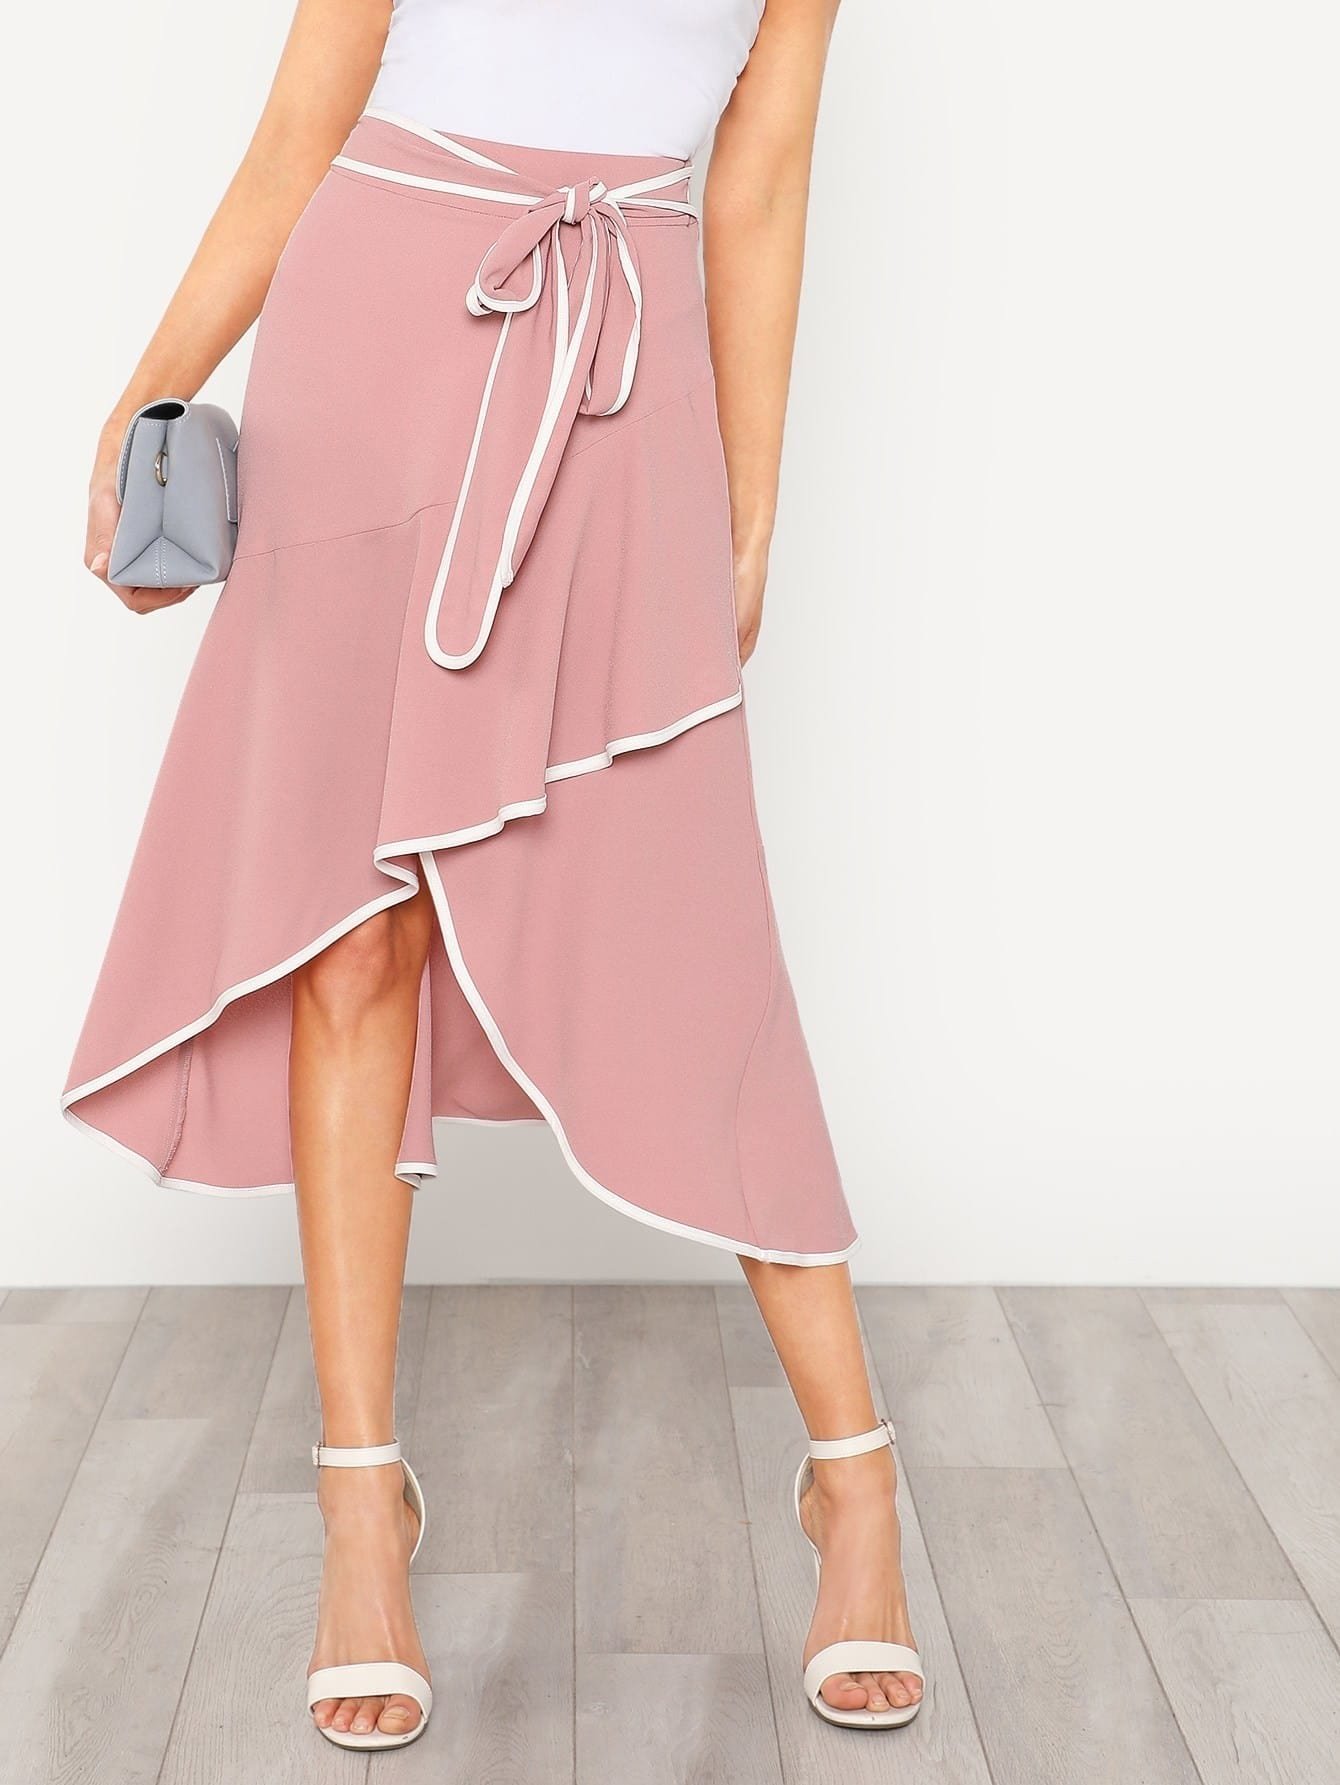 Contrast Binding Self Tie Asymmetric Ruffle Skirt self tie waist ruffle skirt